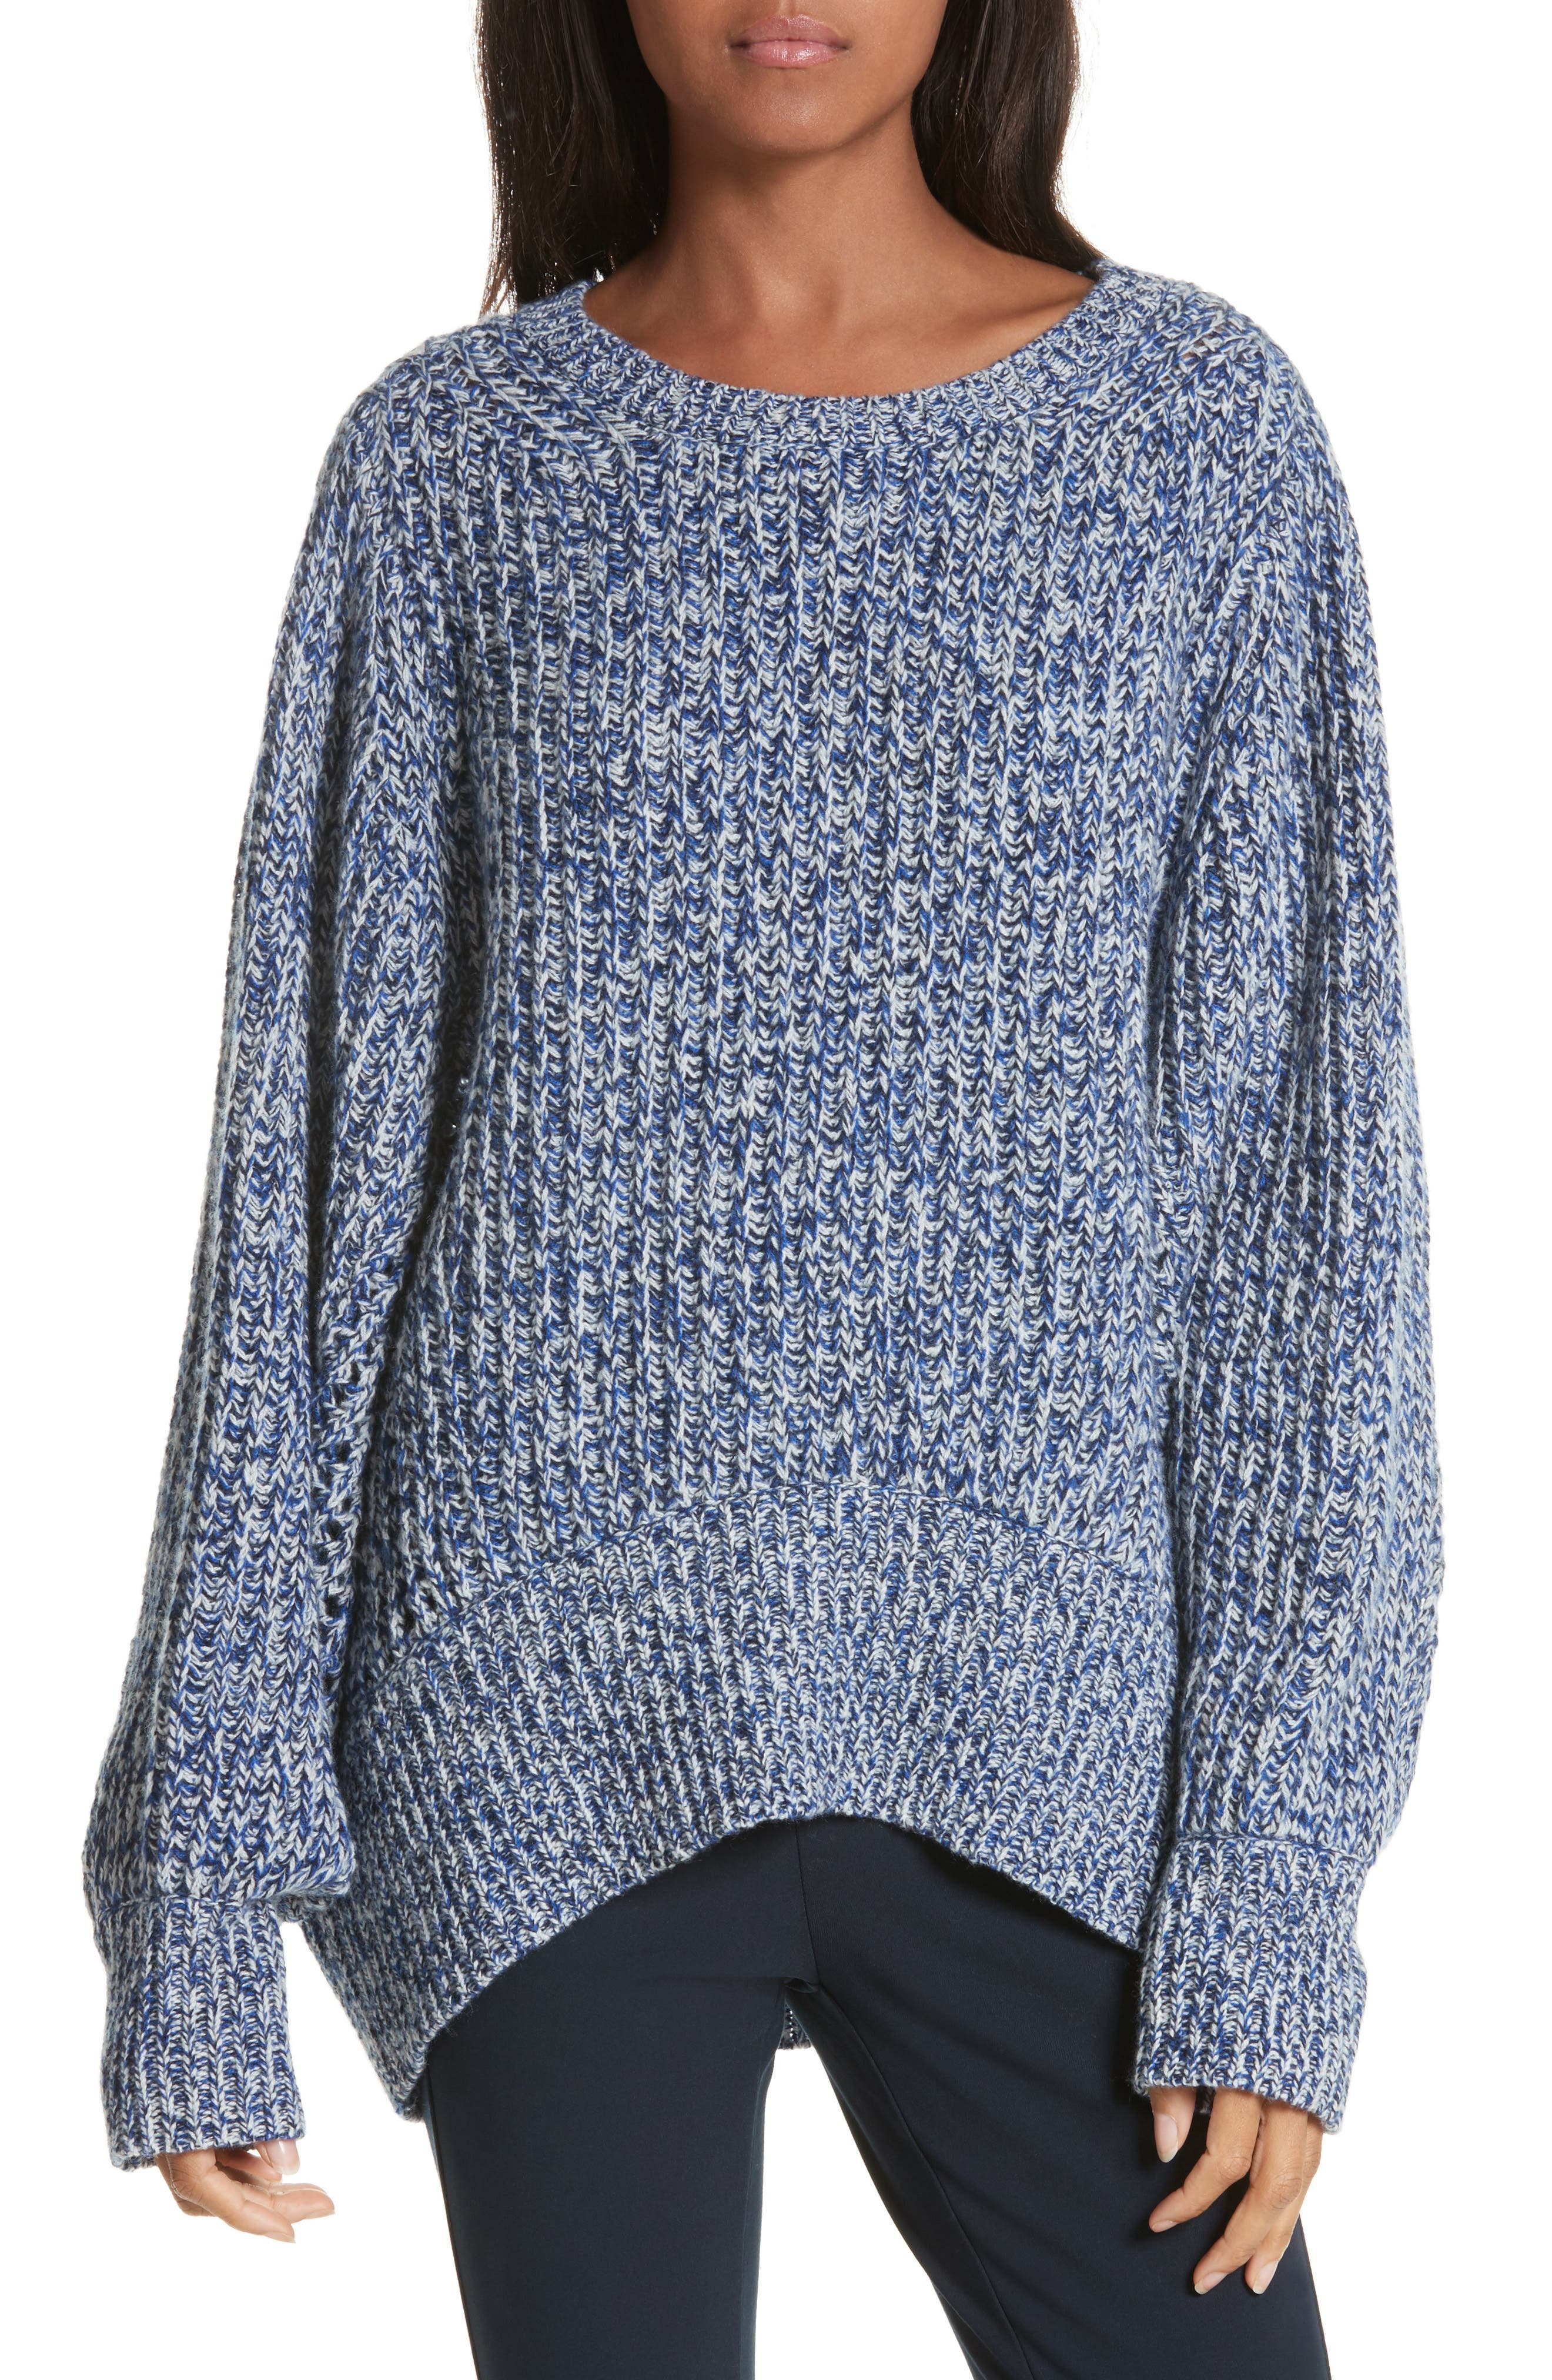 Alternate Image 1 Selected - rag & bone Athena Cashmere Pullover